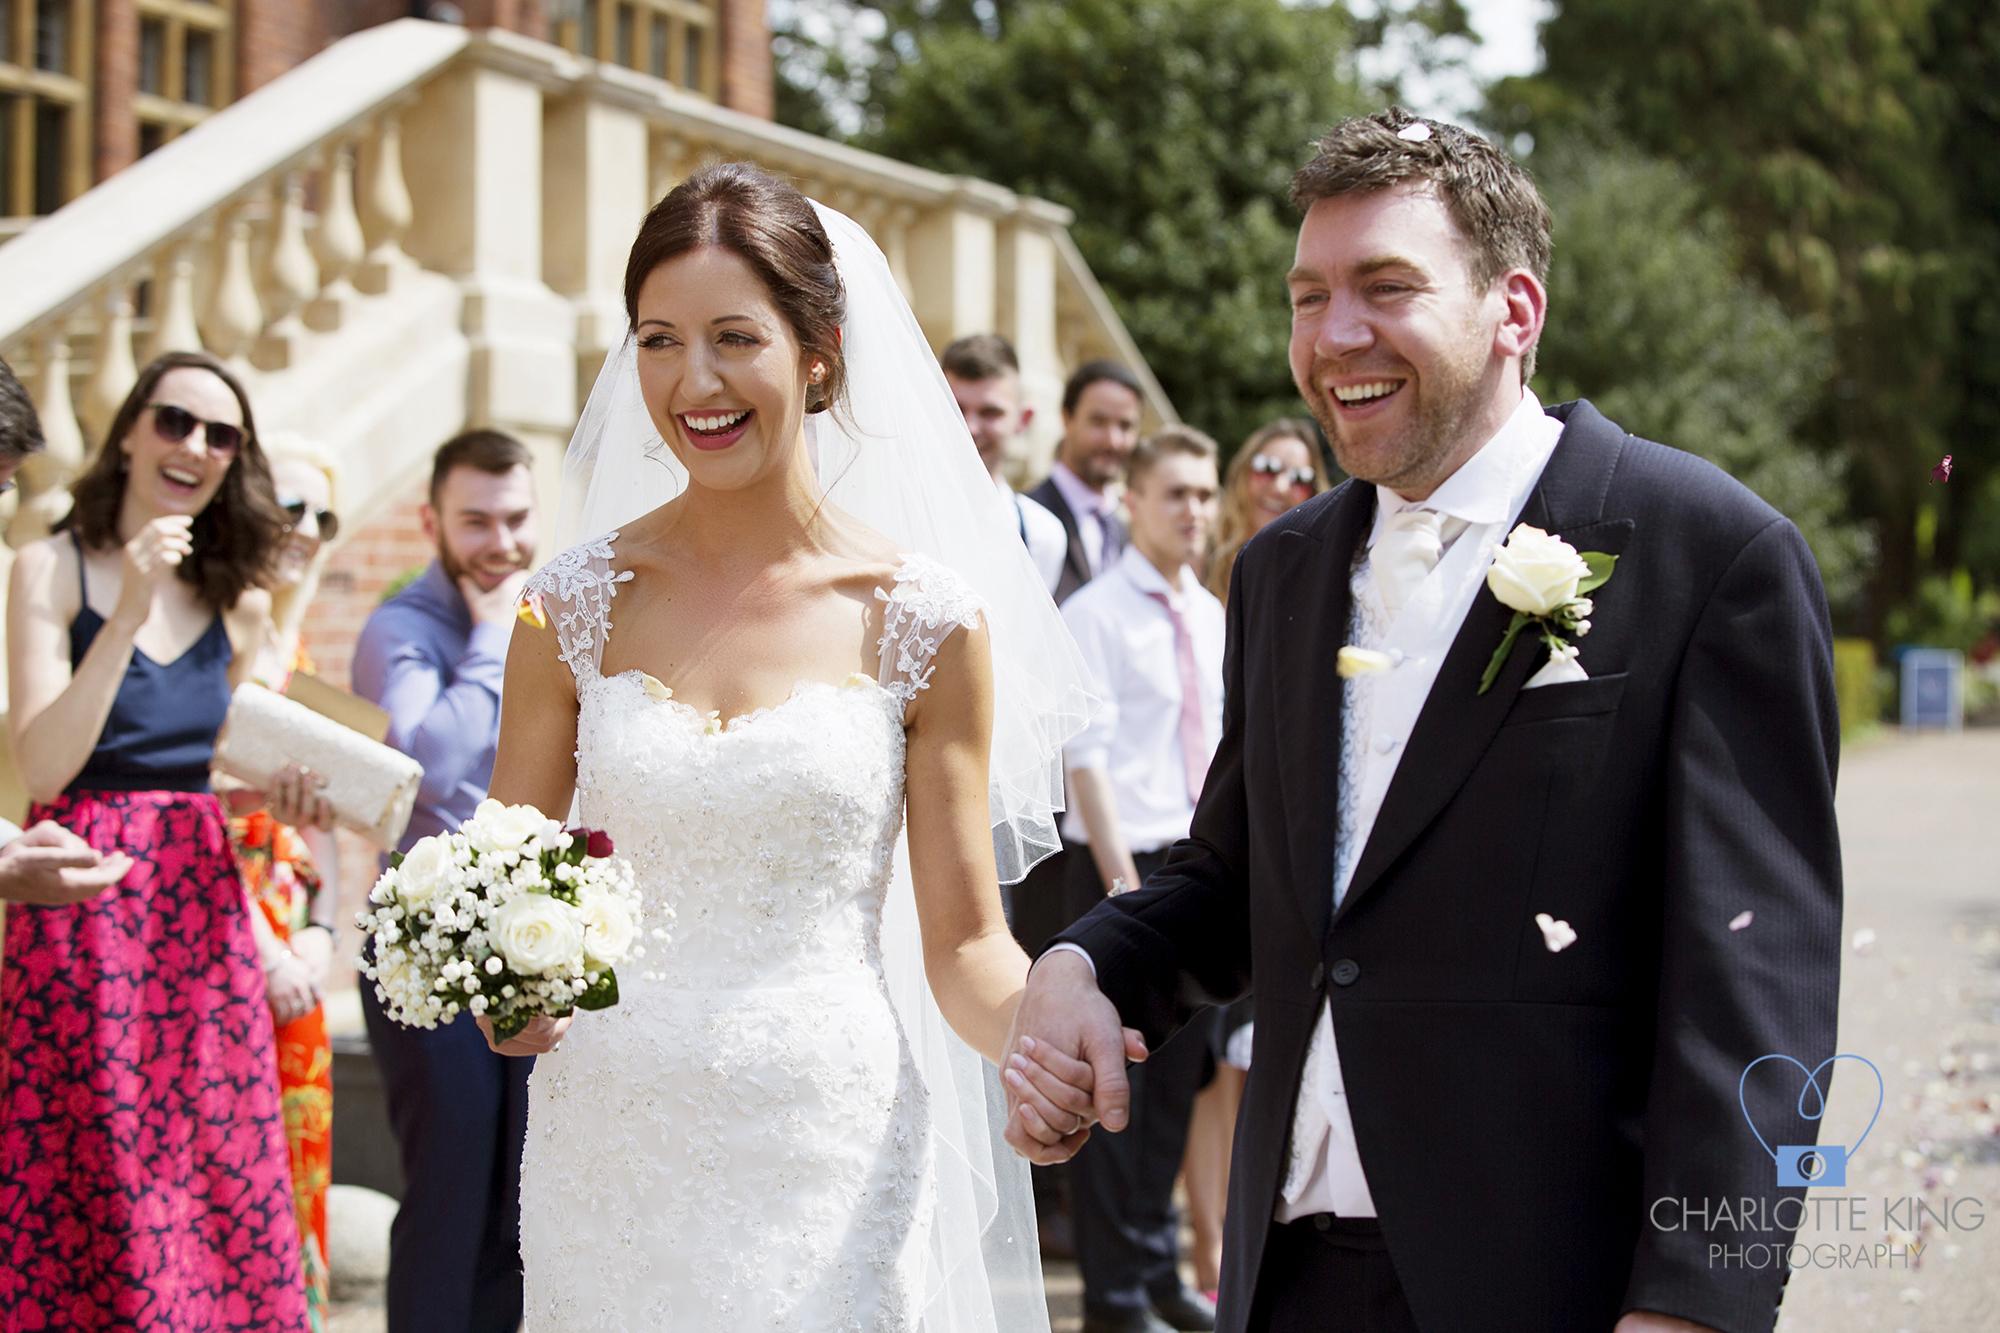 Woldingham-school-wedding-charlotte-king-photography (92)